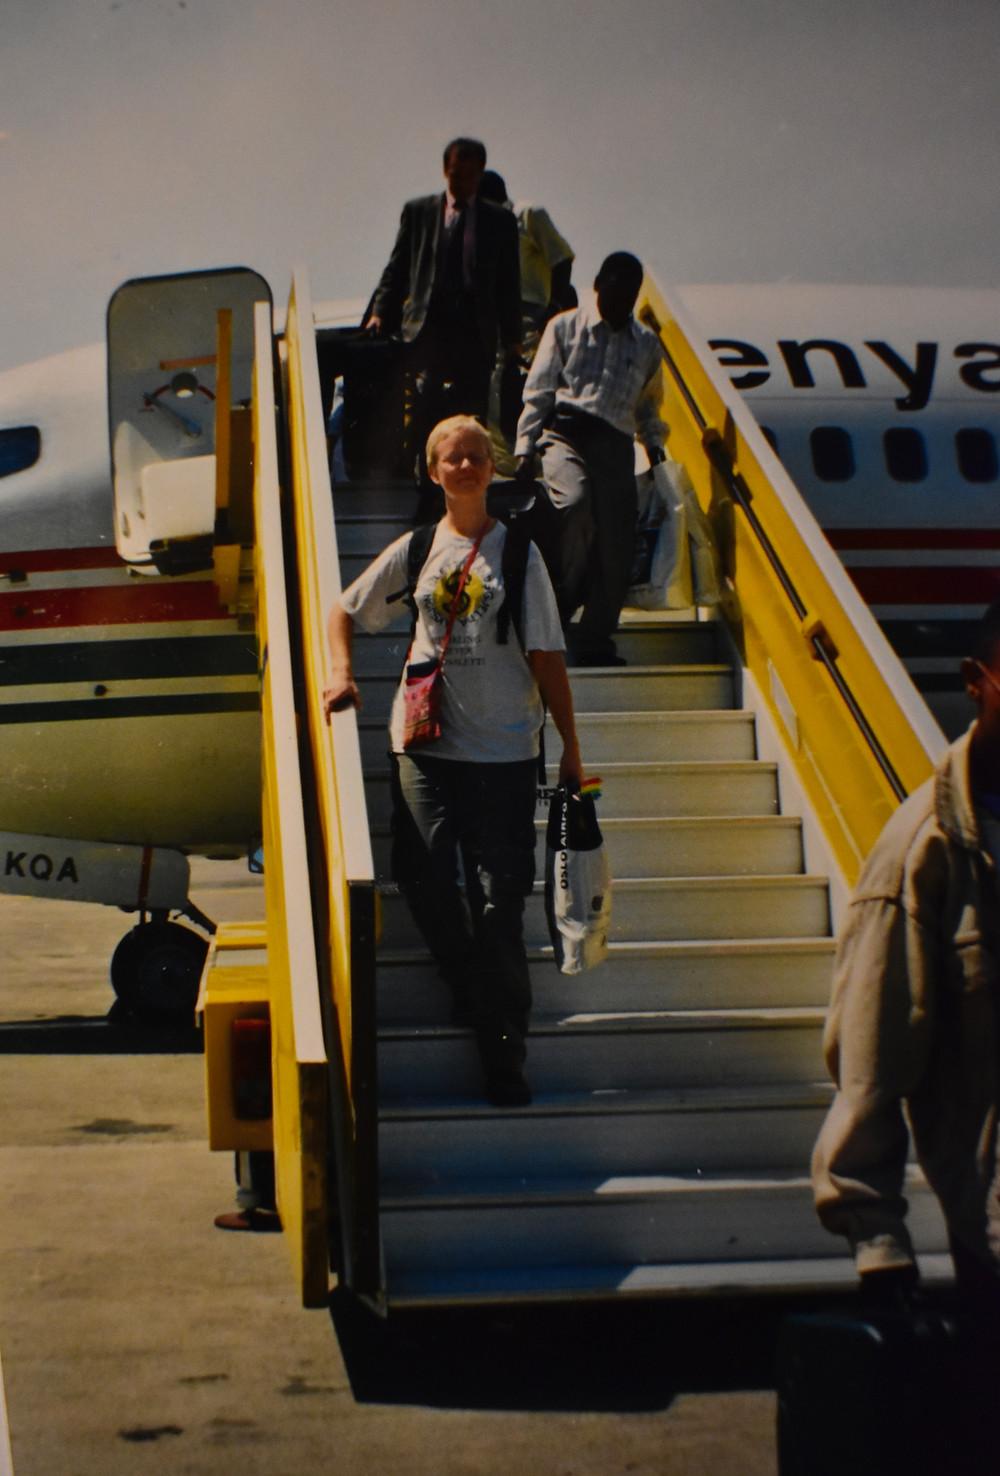 Alakara reiser, Entebbe, Ingeborg Sæbø Oluka, Entebbe, Uganda